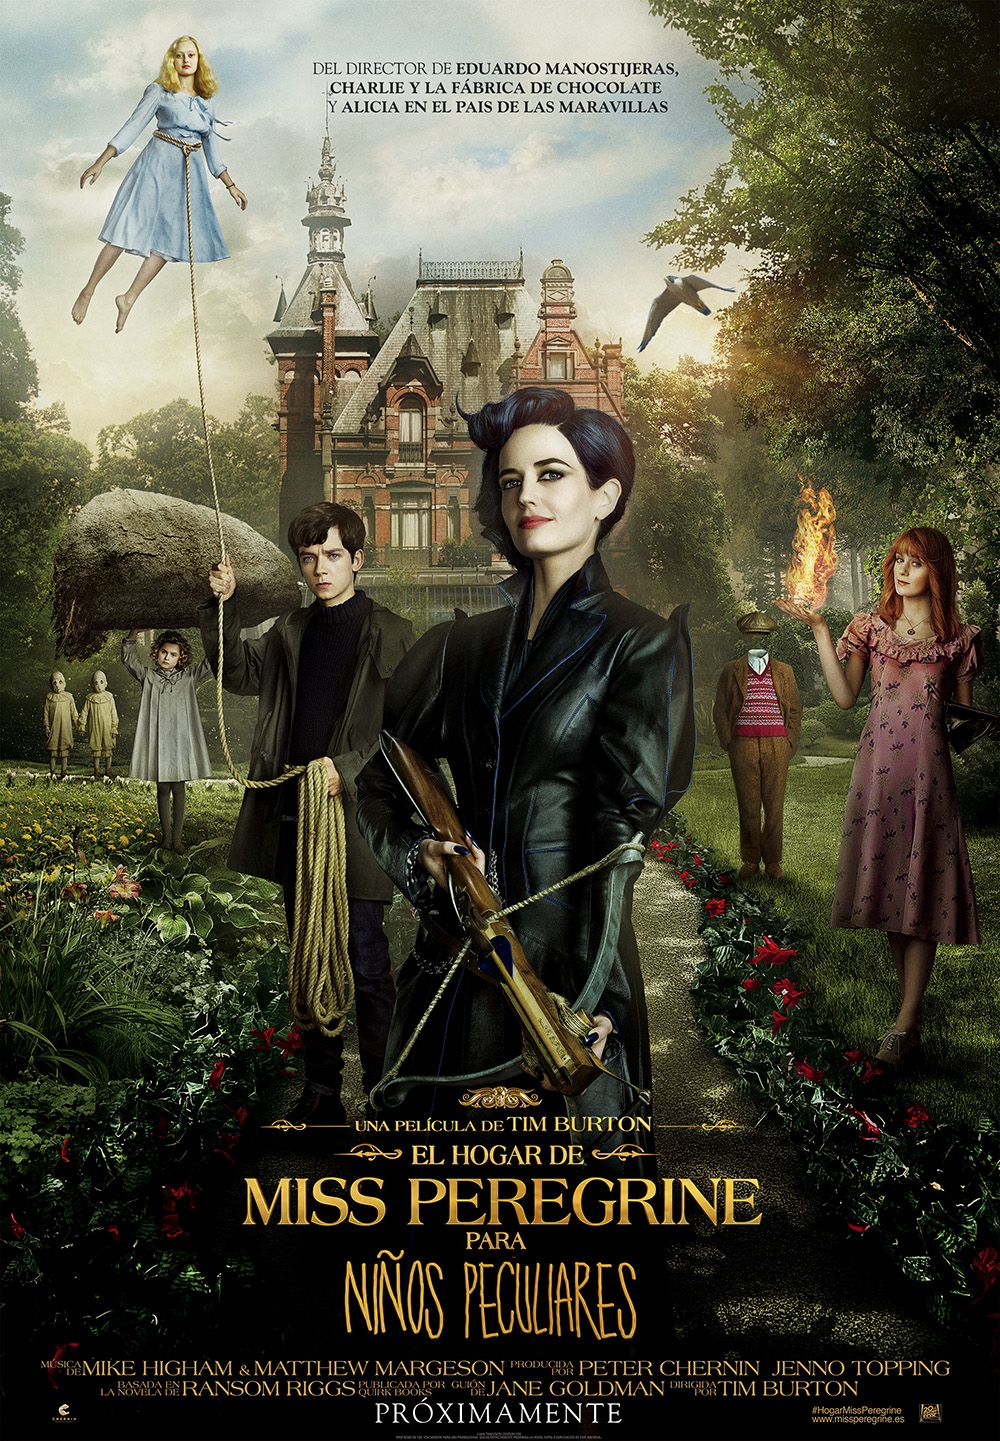 El Hogar De Miss Peregrine Para Niños Peculiares Película 2016 Sensacine Com